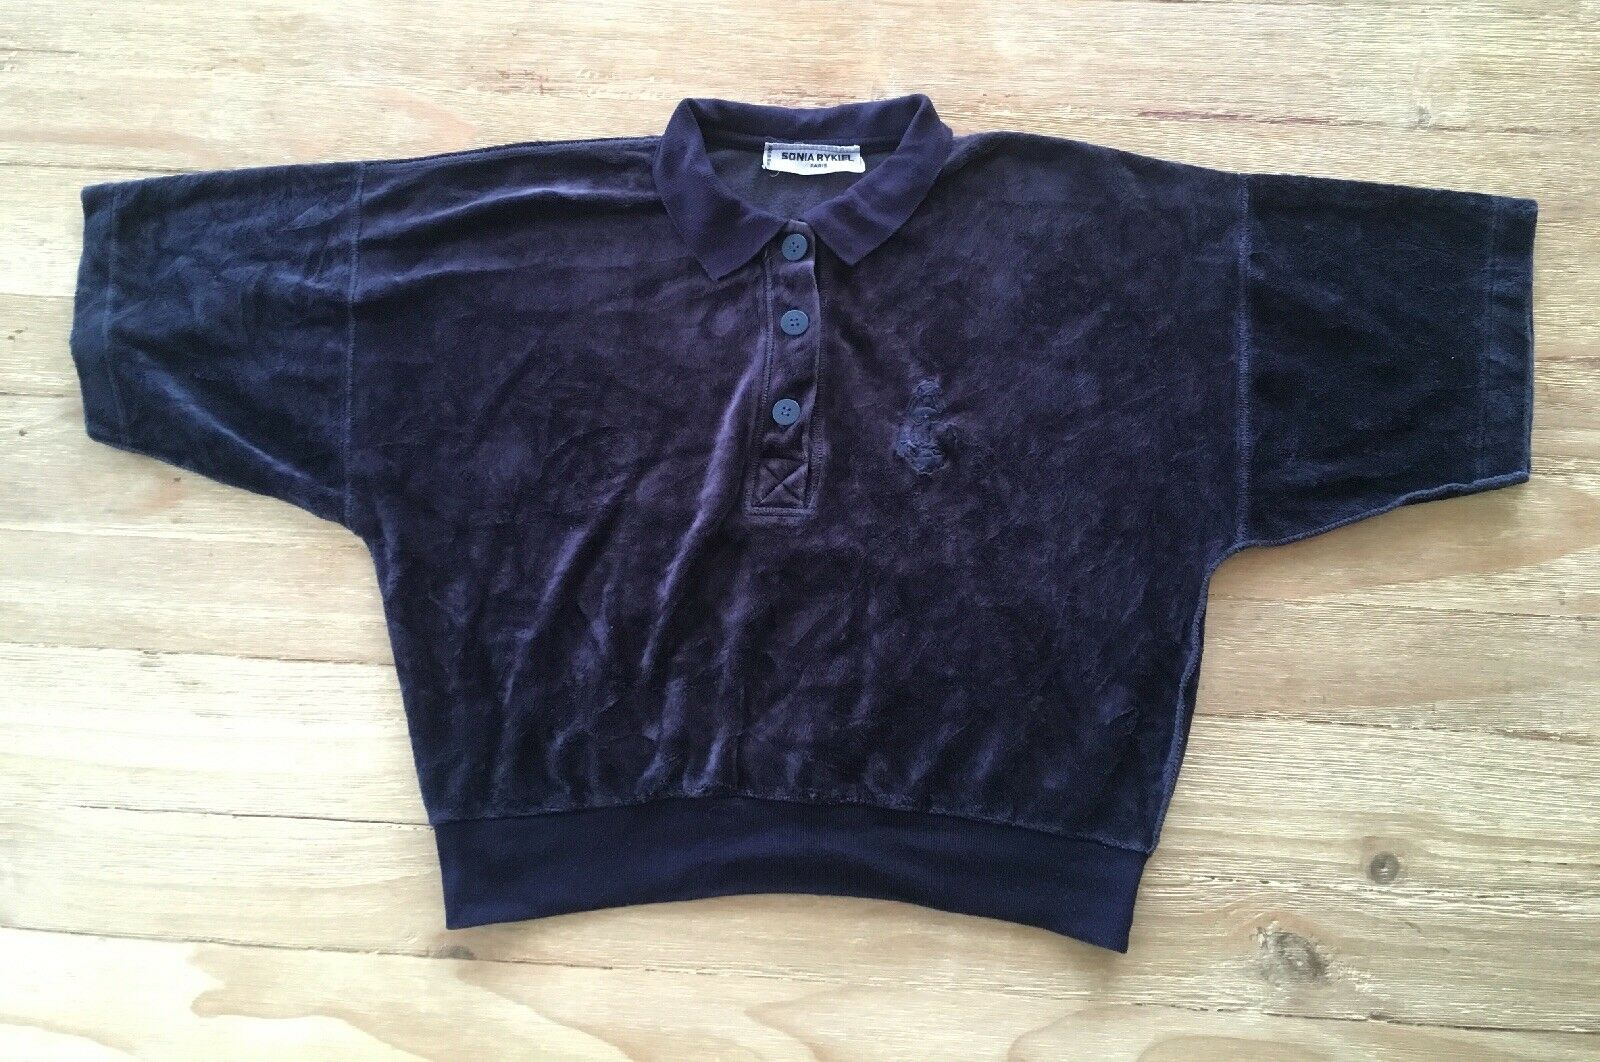 "Vintage Sonia Rykiel Paris Dark Blau Velour Polo Top Short Sleeve Chest 42"""